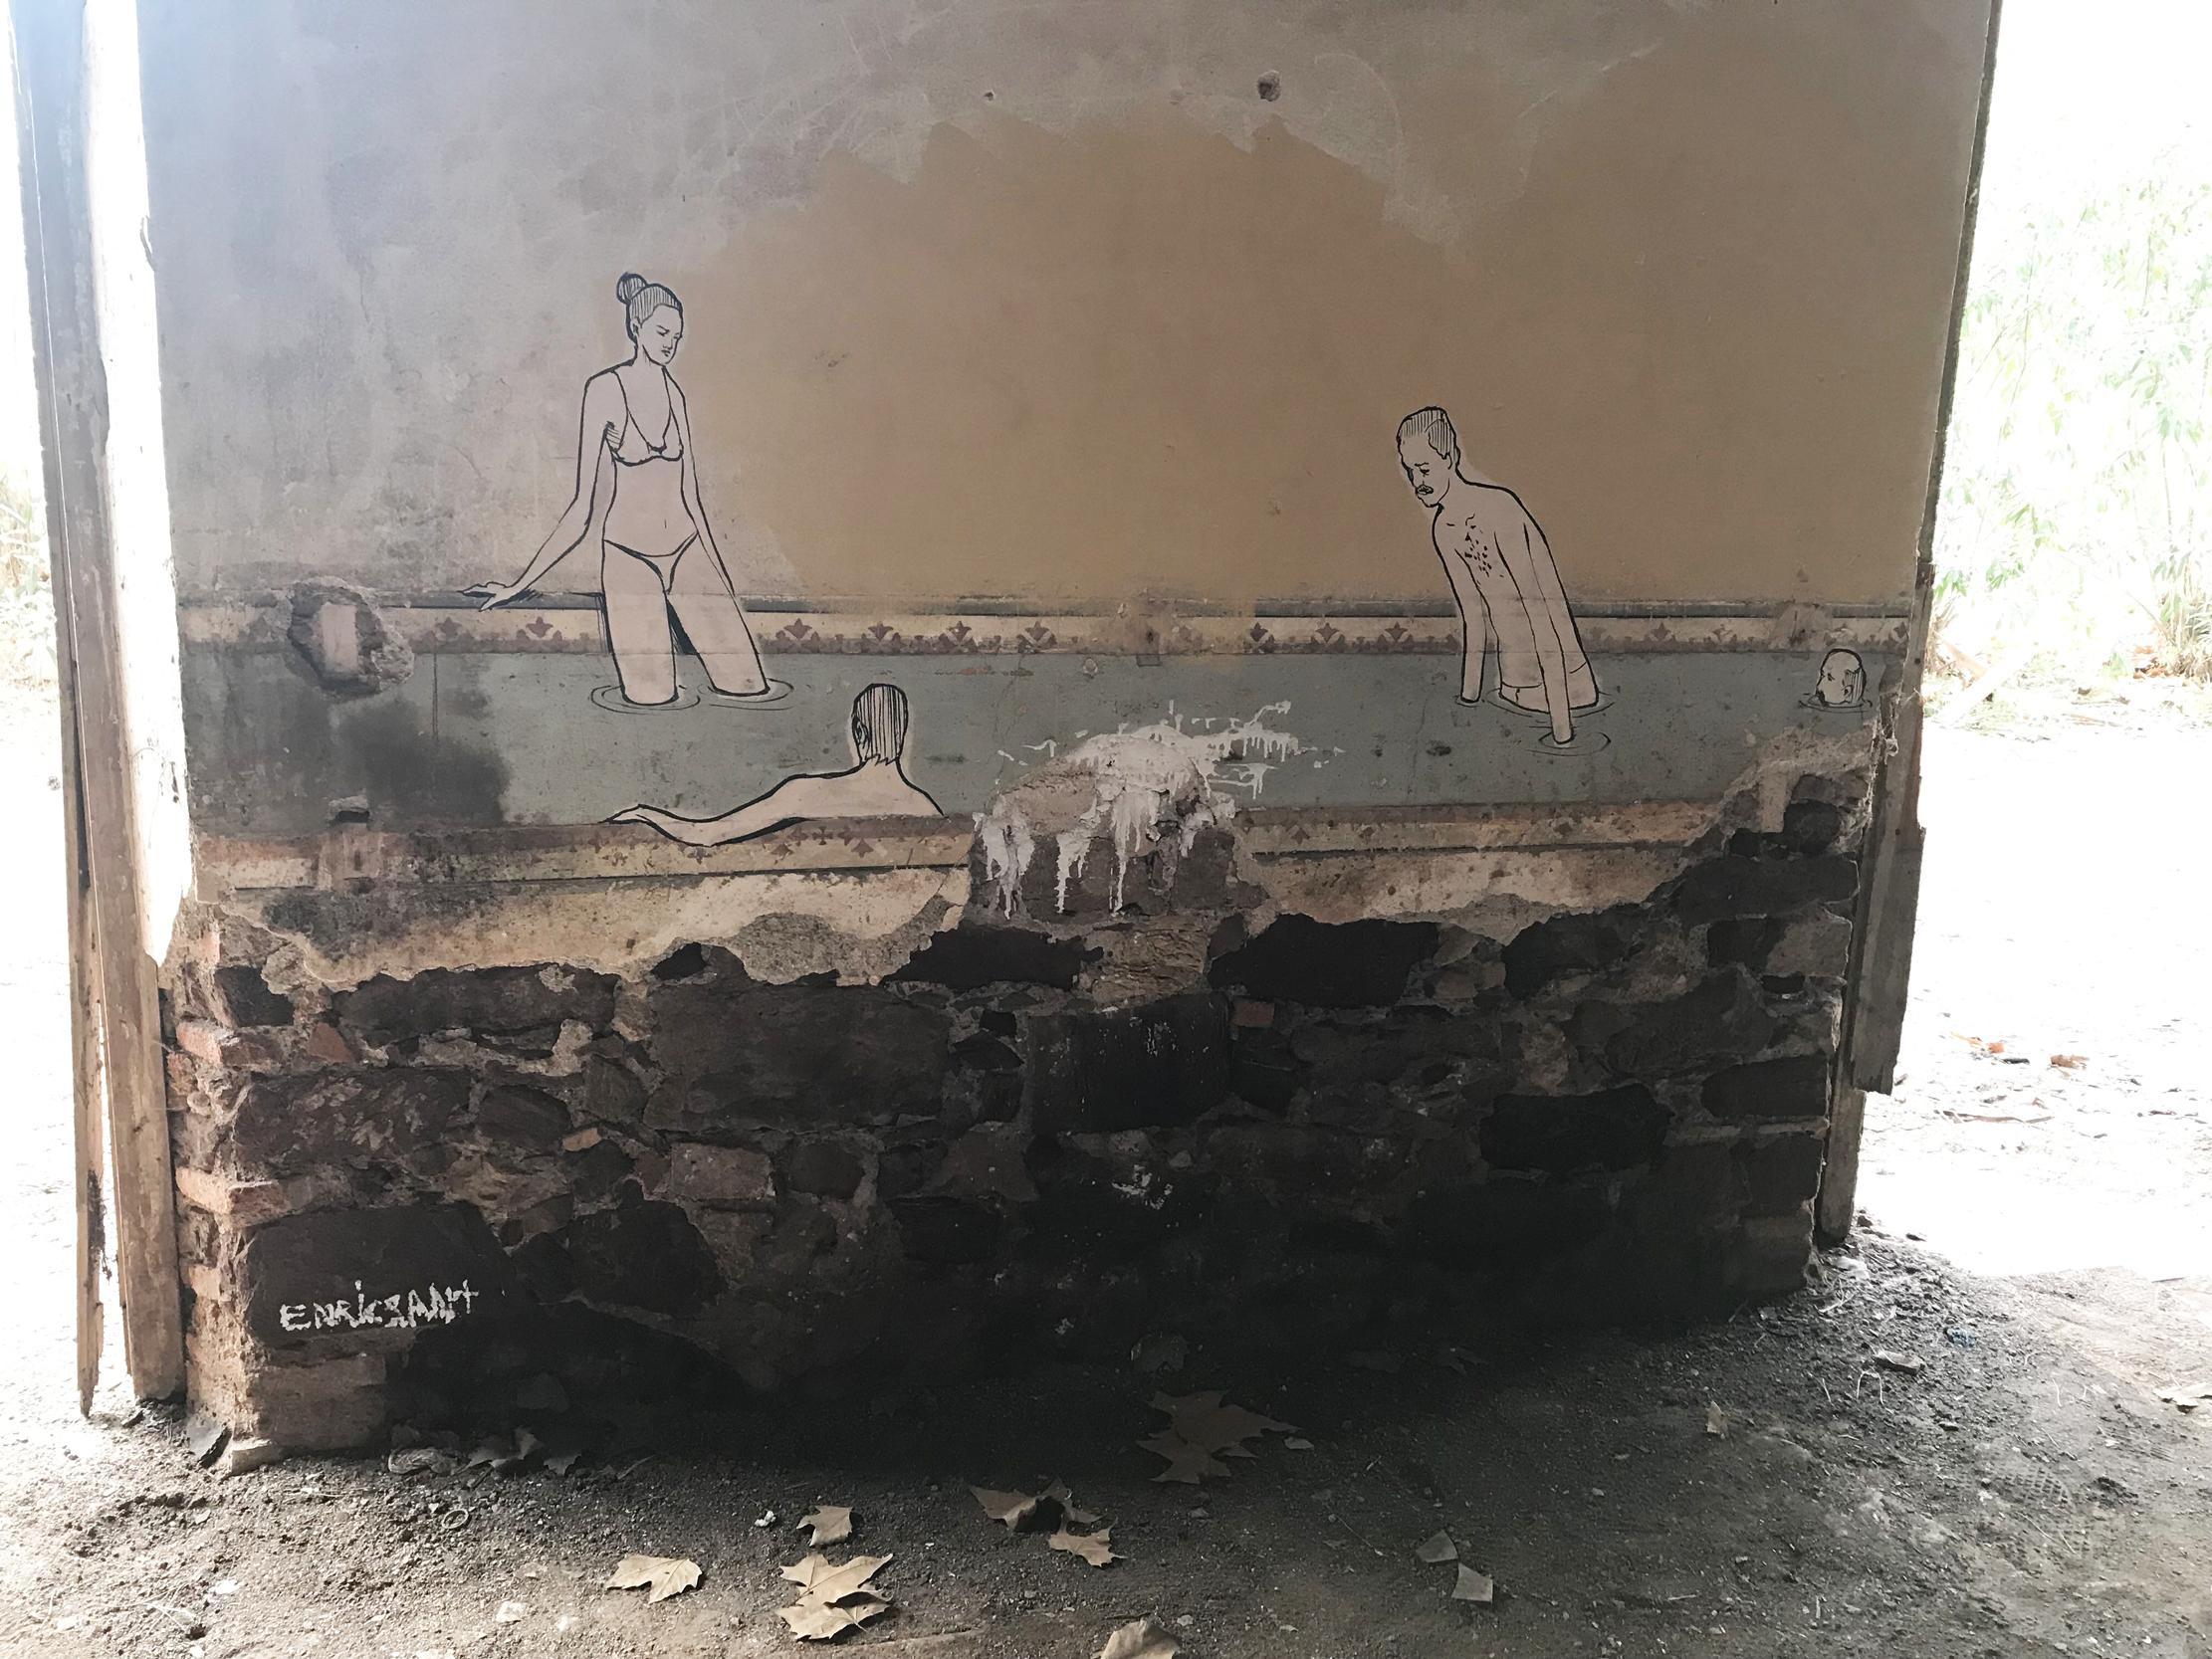 Arte urbano de Enric Sant